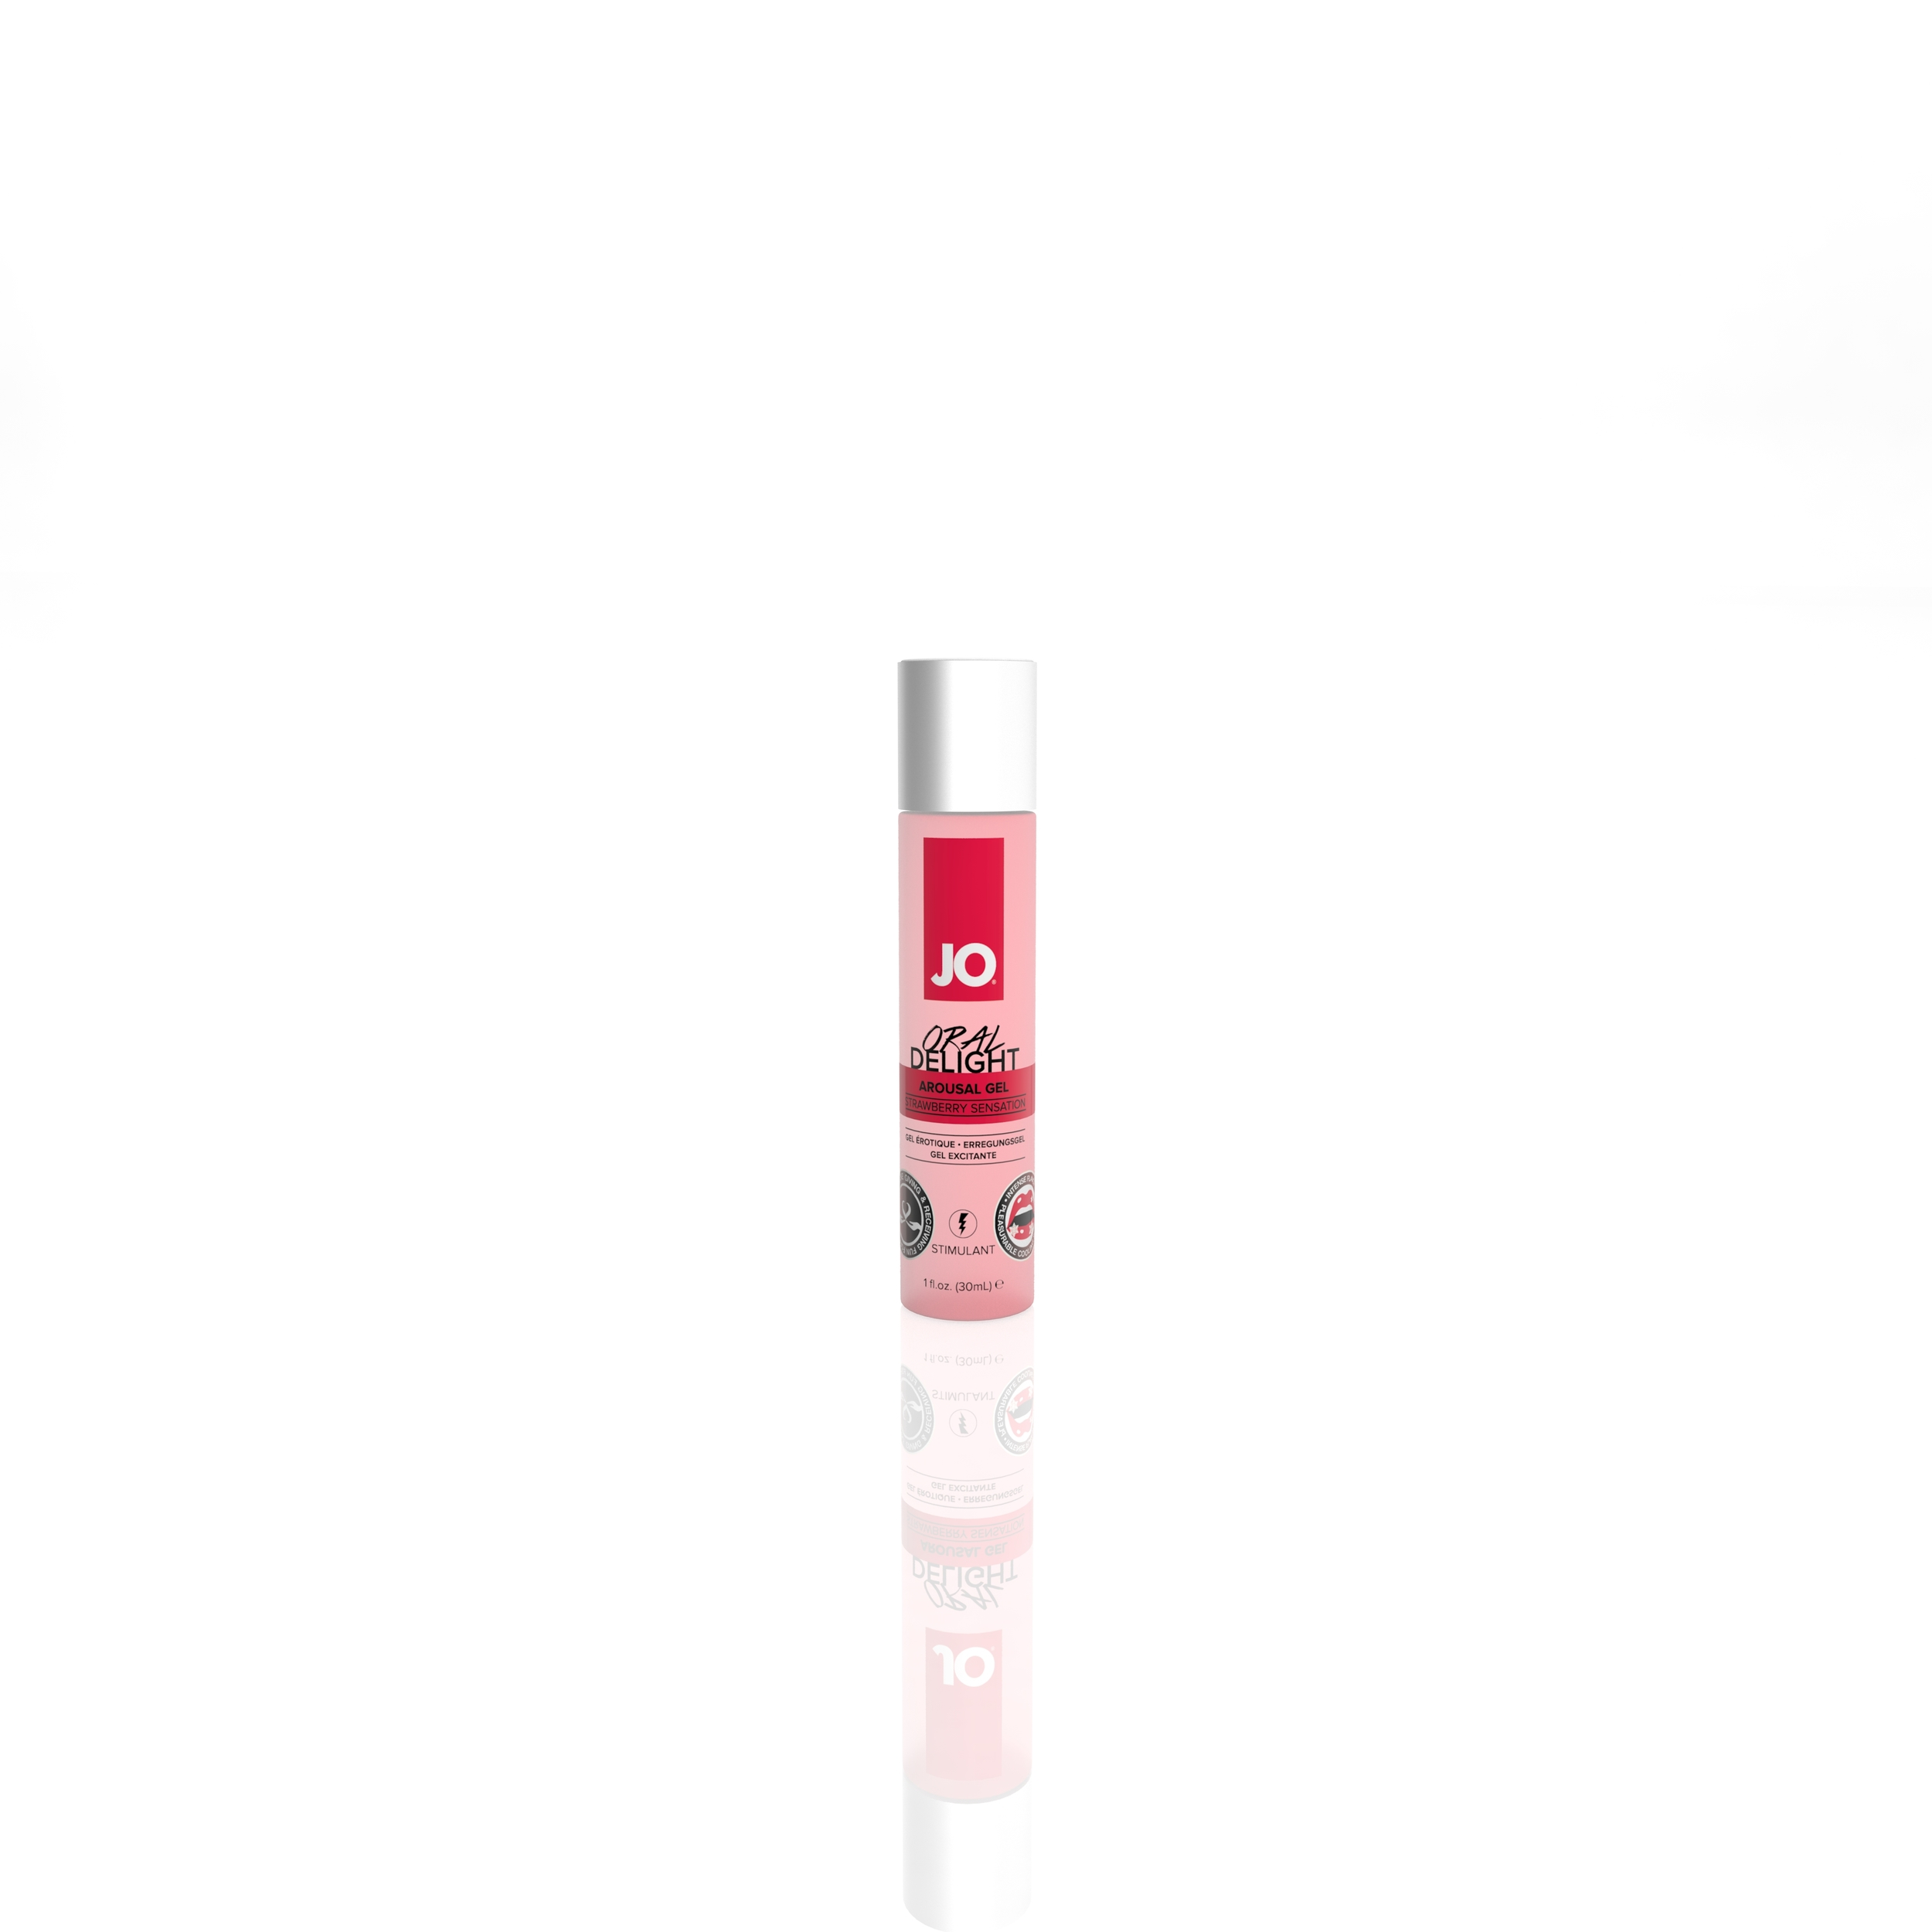 40481 - JO ORAL DELIGHT - STRAWBERRY SENSATION - 1fl.oz 30mL Bottle.jpg